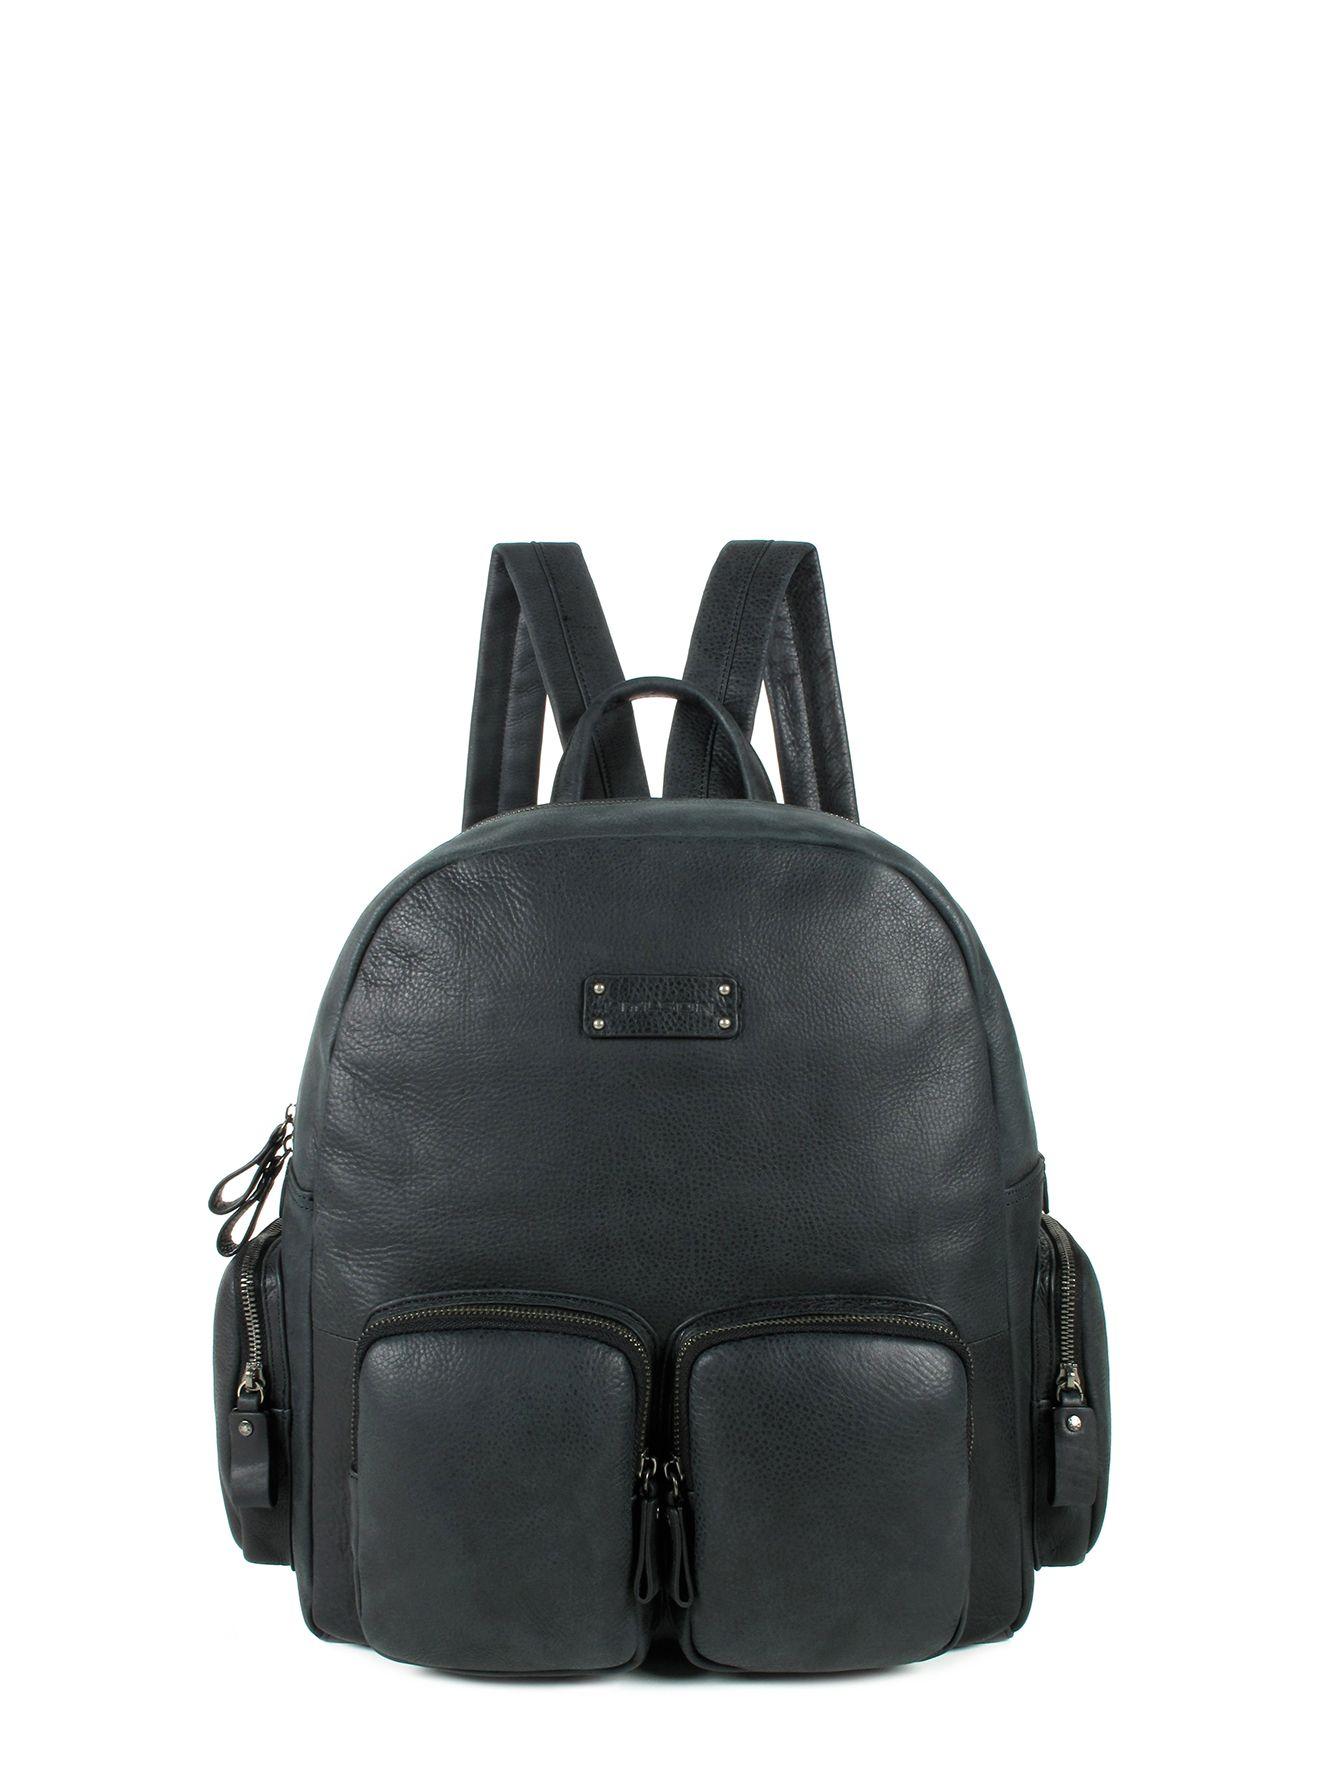 sac a dos cuir vachette brad sur wylson paris. Black Bedroom Furniture Sets. Home Design Ideas